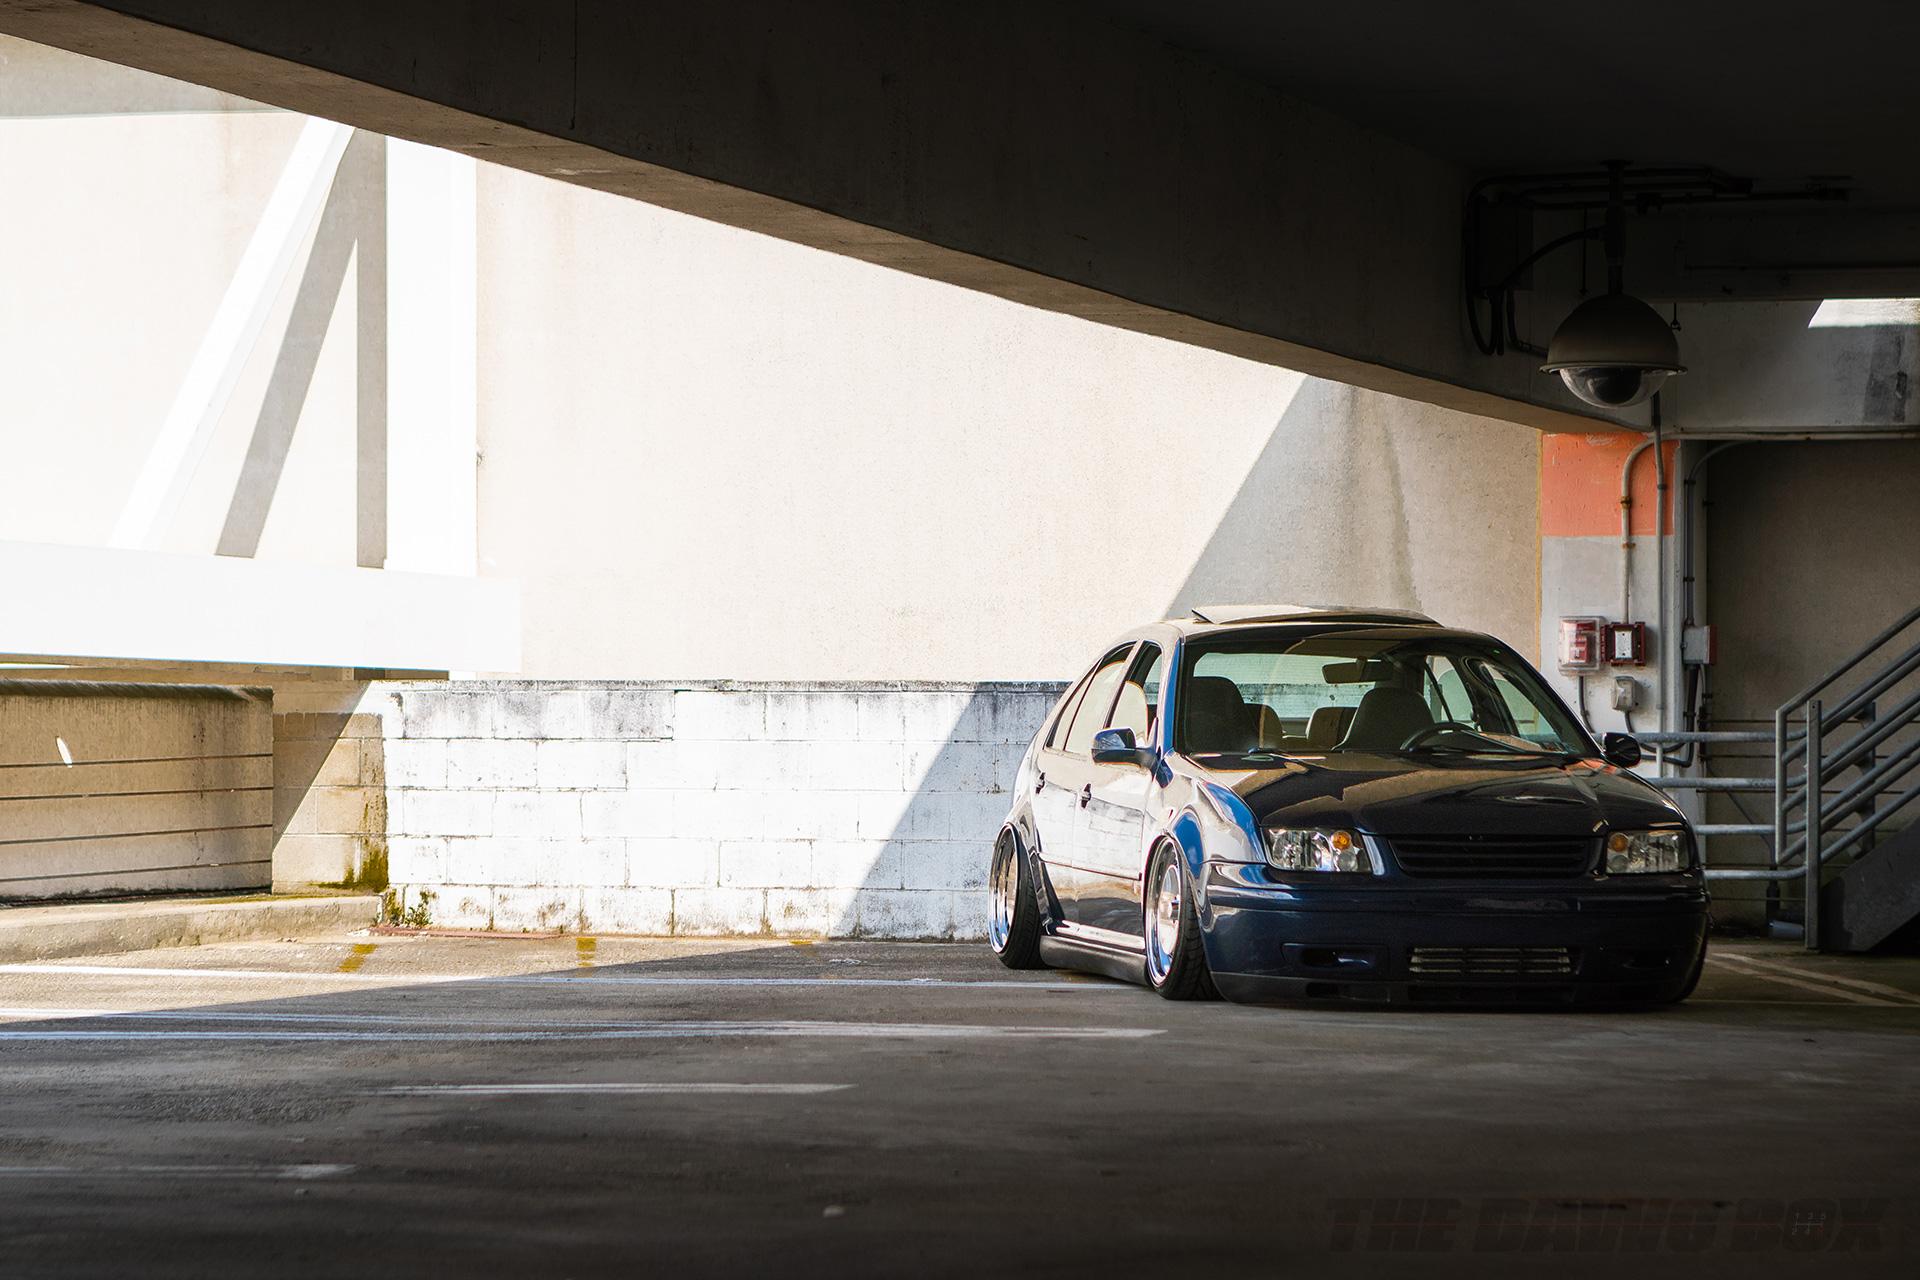 Slammed VW Jetta at H2Oi